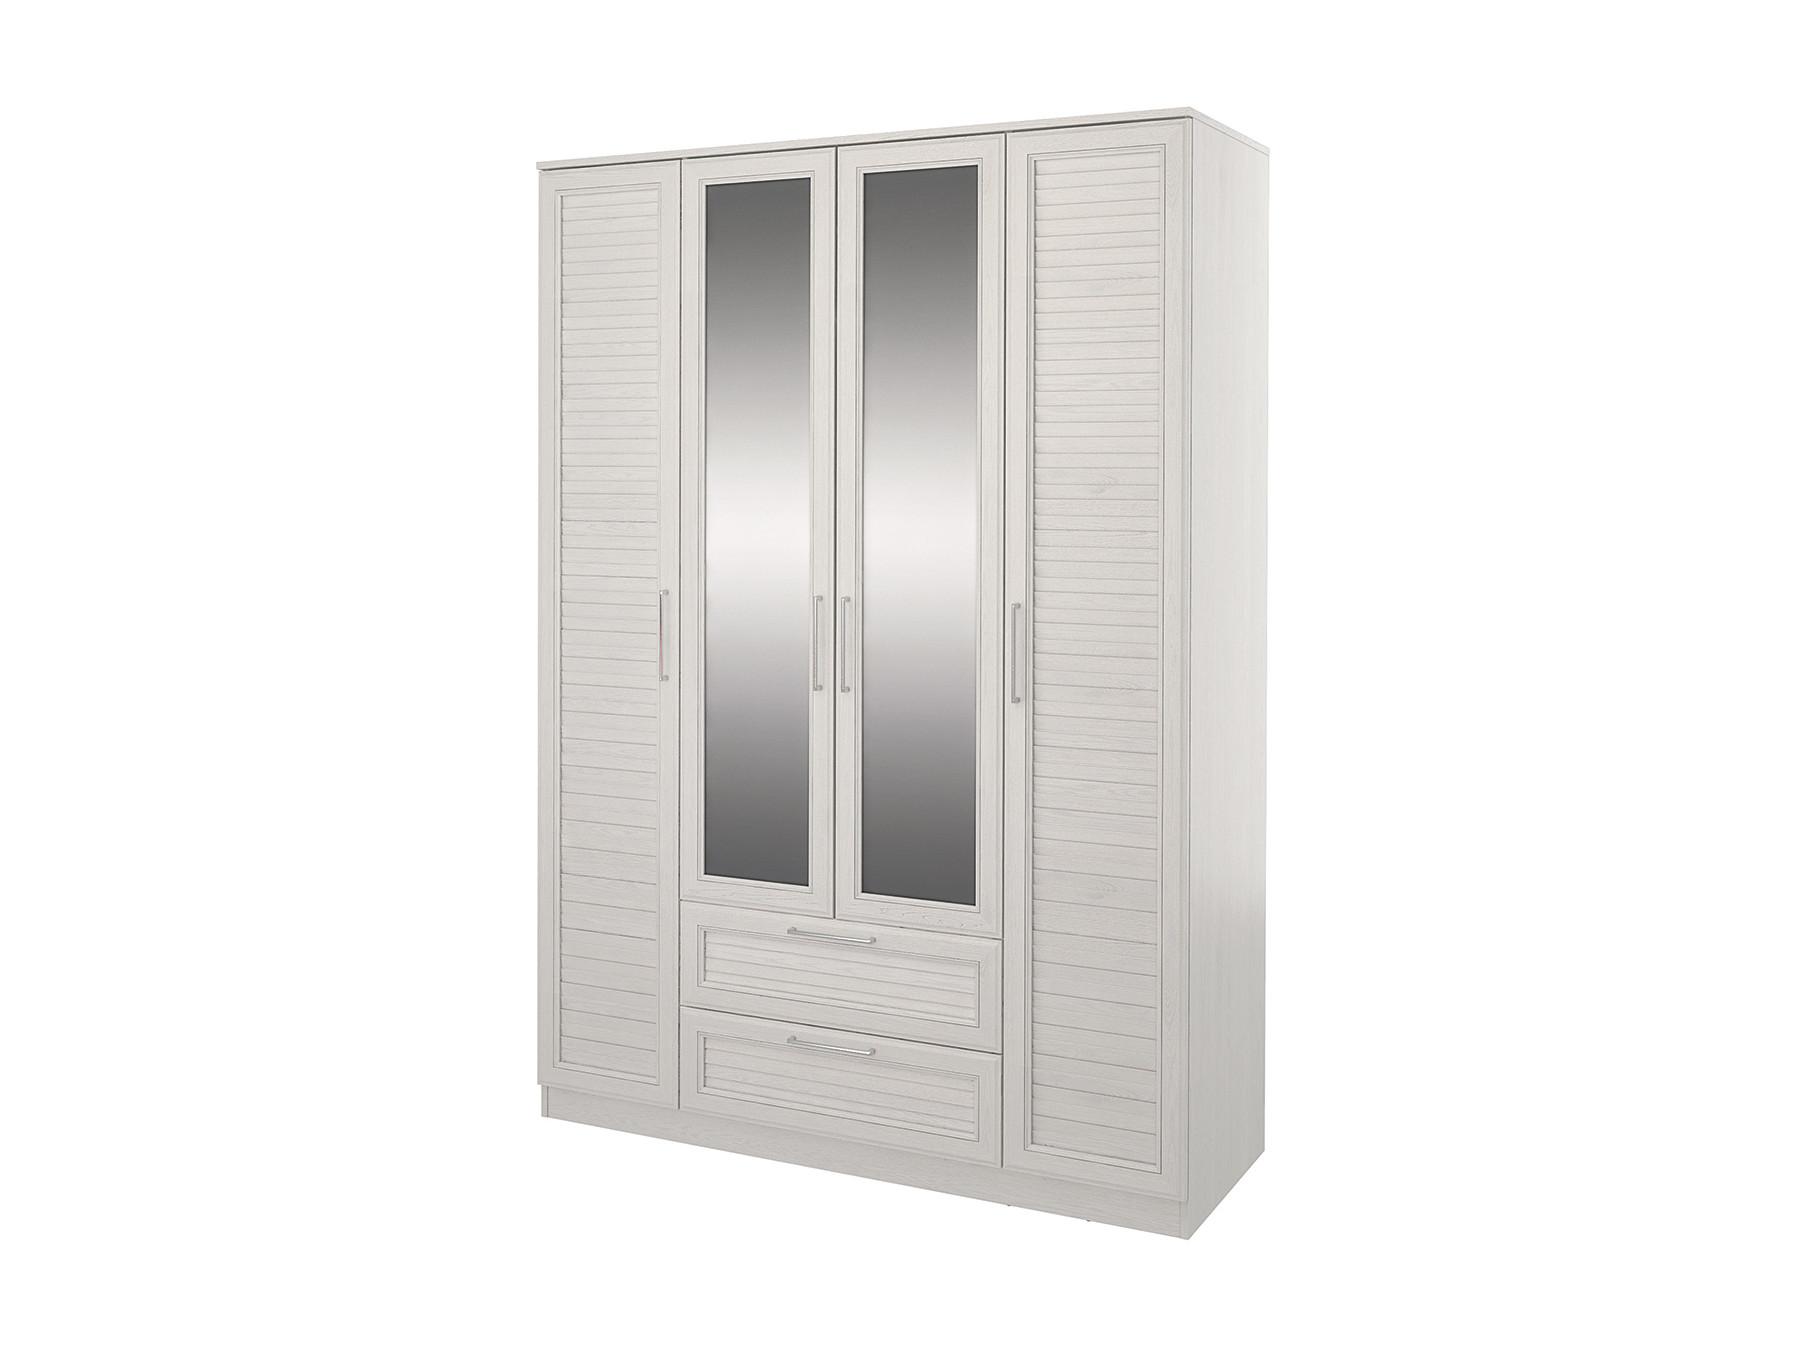 Шкаф 4-х дверный Лоретт Дуб белый, Белый, МДФ профиль, ДСП Белый, Дуб белый